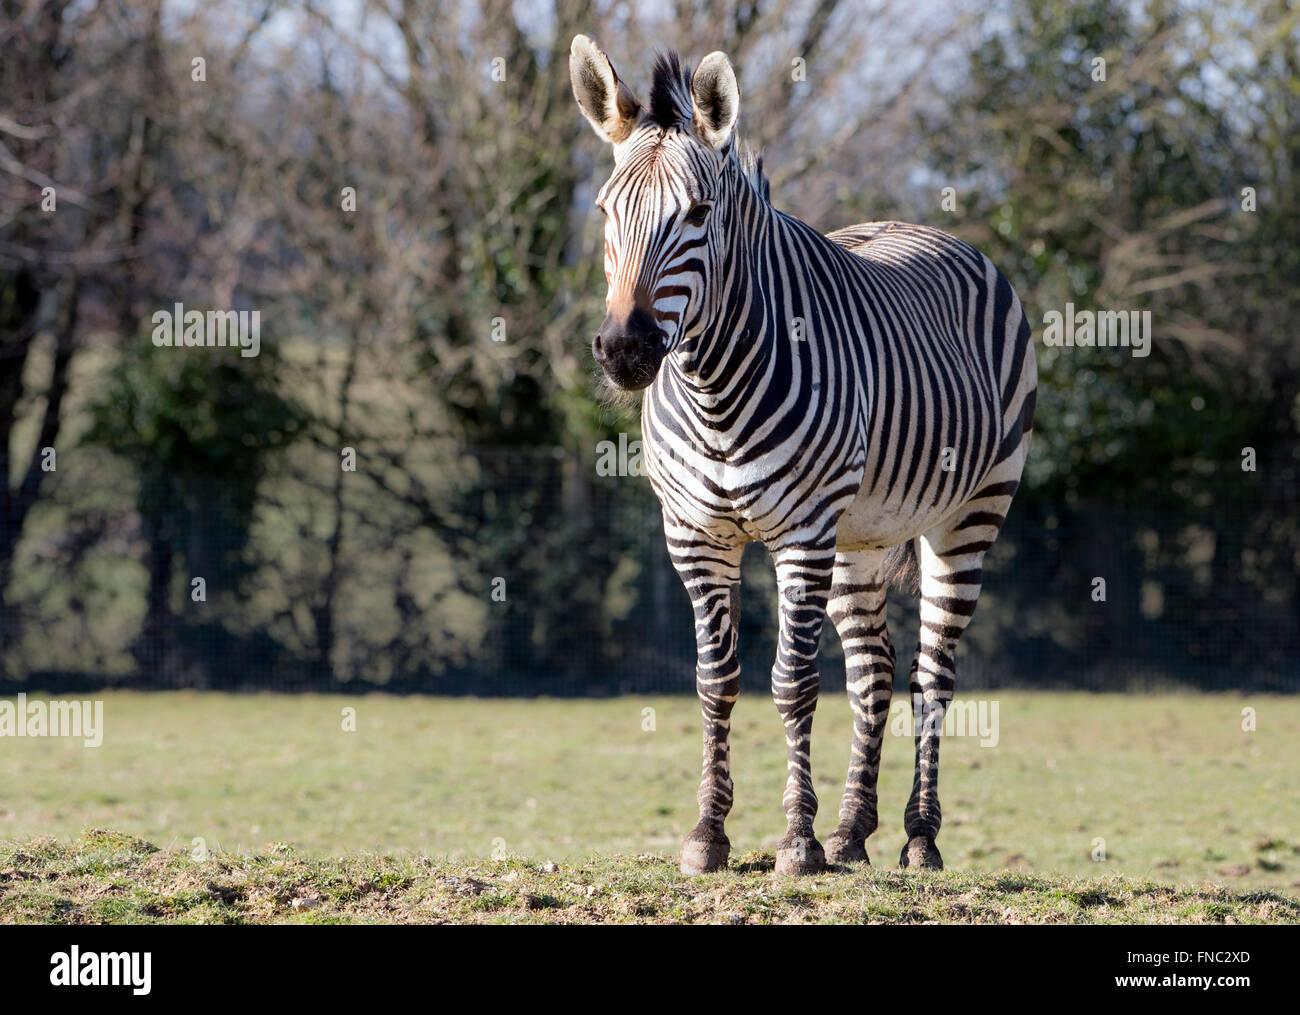 Hartmann's mountain zebra in pasture, looking towards camera - Stock Image